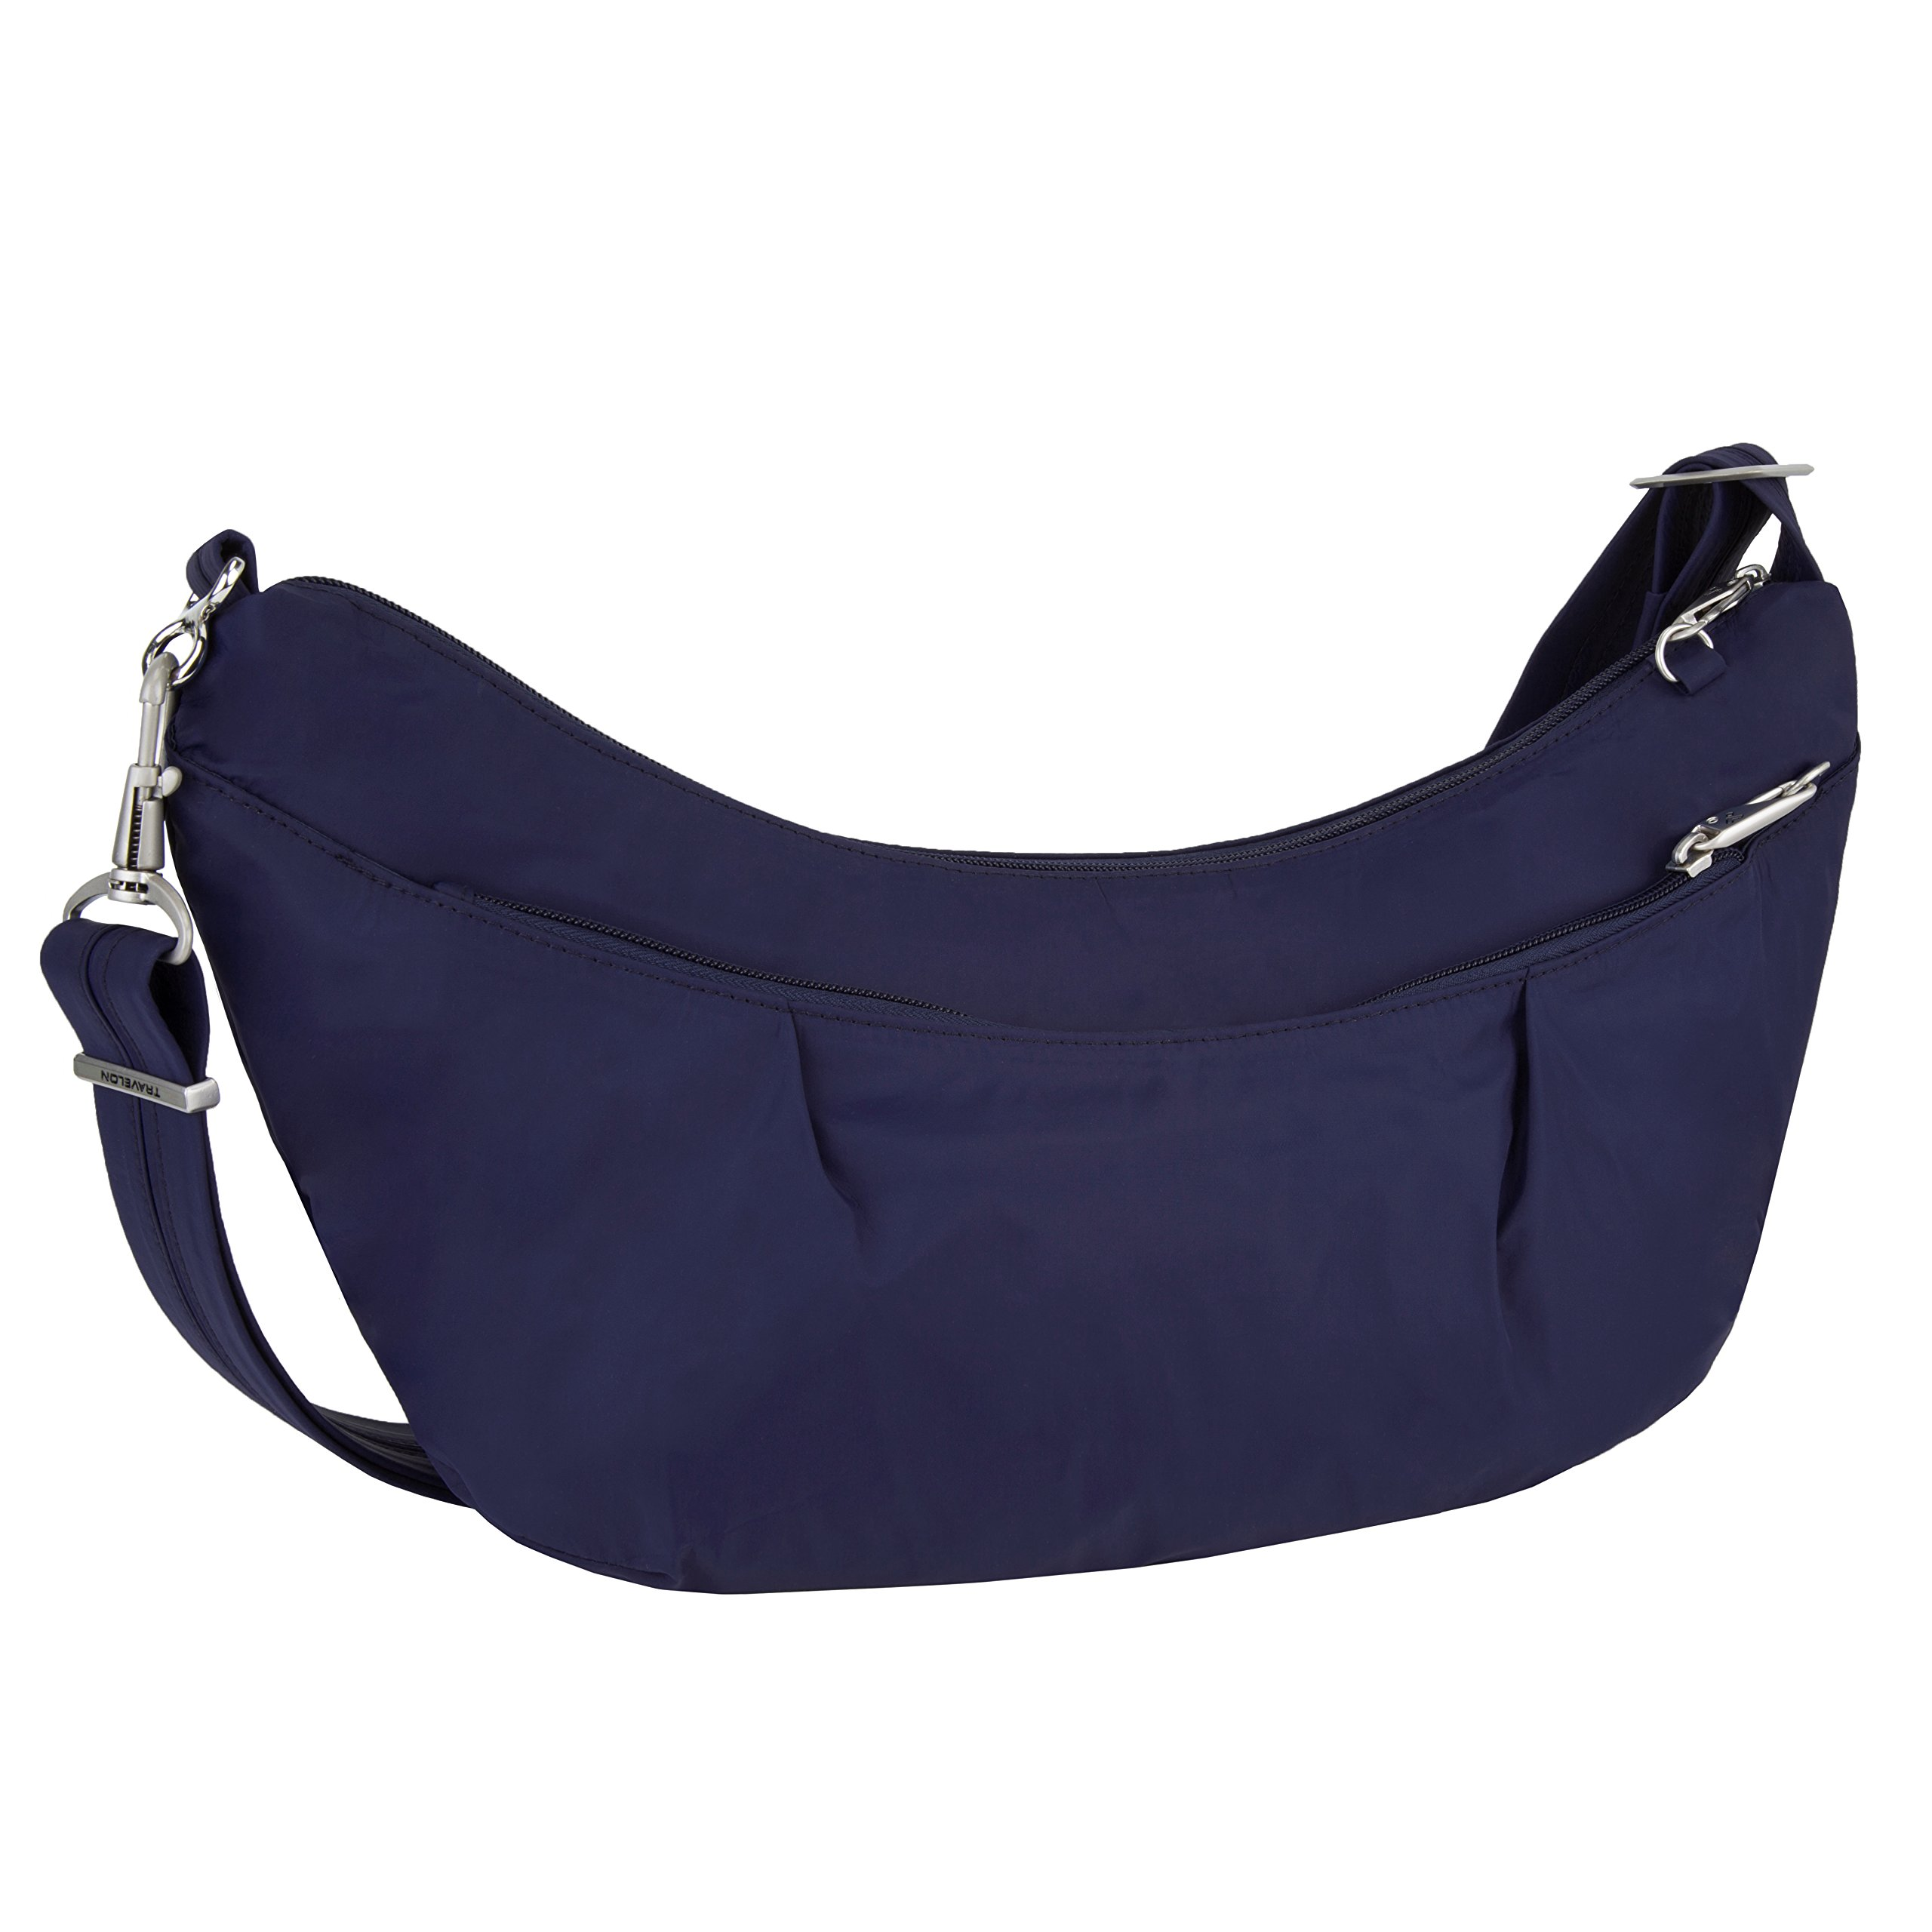 Travelon Women's Classic Light Sling-Style Hobo Travel Purse, Lush Blue, One Size